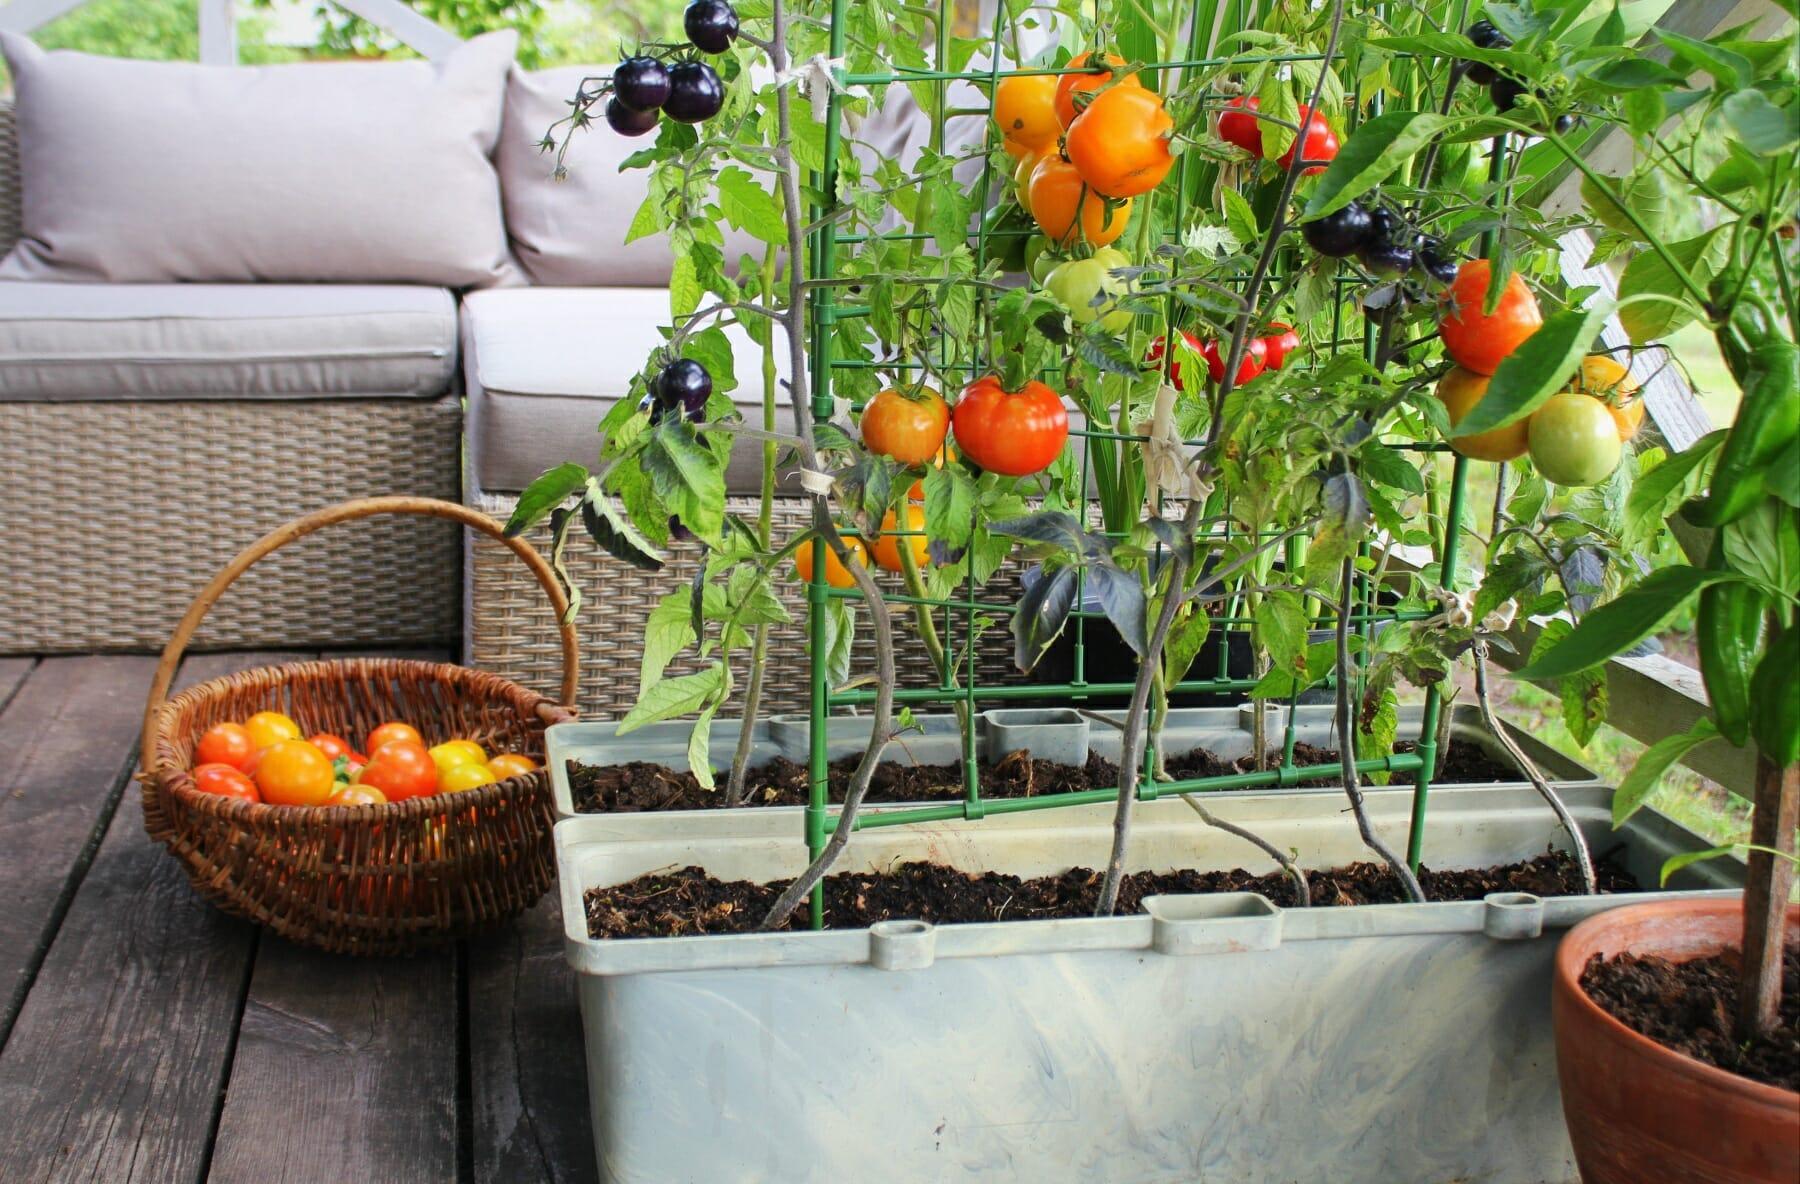 Grow an apartment garden for fresh veggies